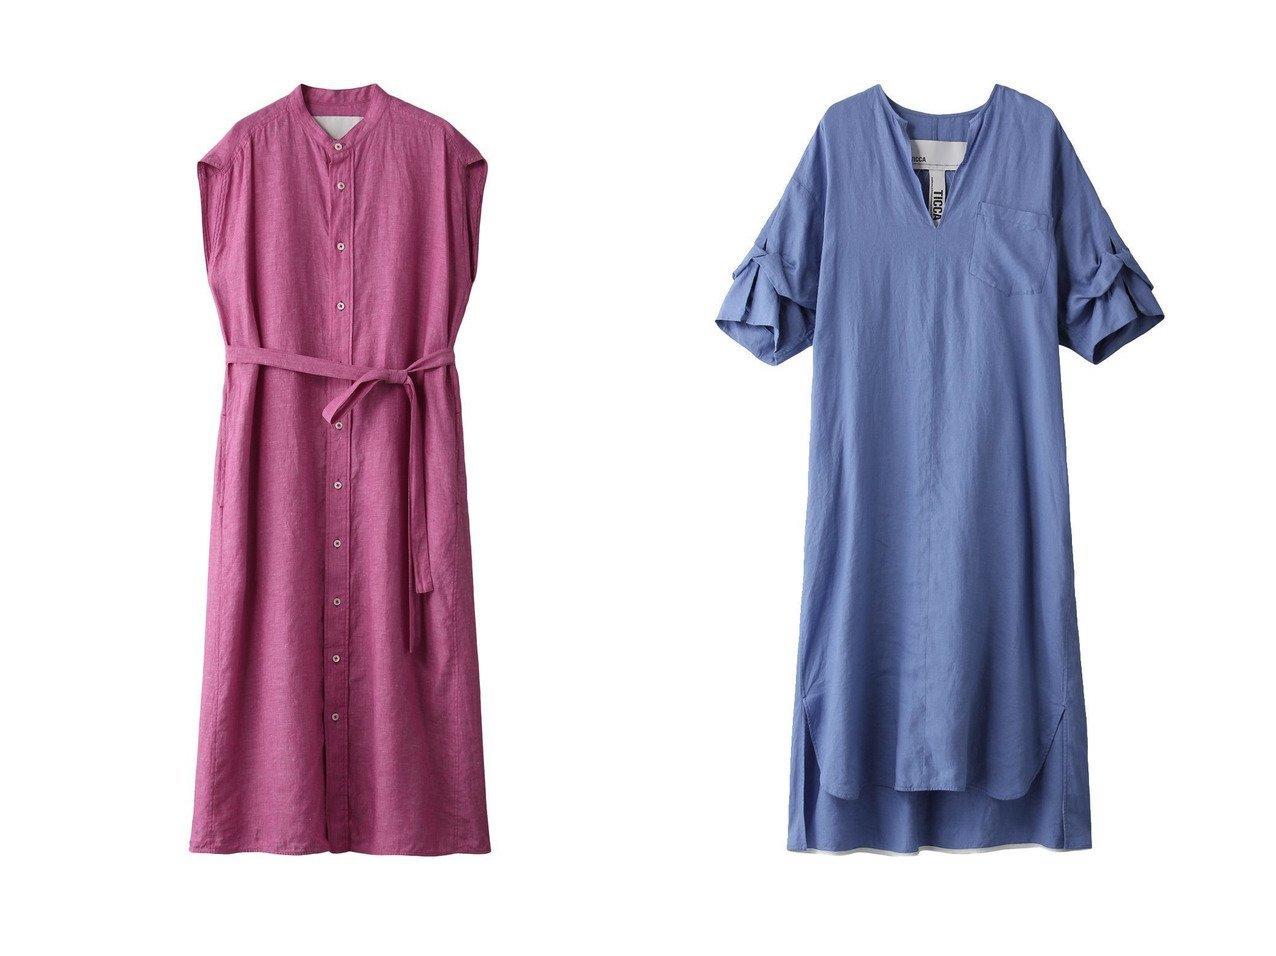 【TICCA/ティッカ】のノーカラーフレンチリネンワンピース&ツイストスリーブリネンワンピース ワンピース・ドレスのおすすめ!人気、トレンド・レディースファッションの通販 おすすめで人気の流行・トレンド、ファッションの通販商品 メンズファッション・キッズファッション・インテリア・家具・レディースファッション・服の通販 founy(ファニー) https://founy.com/ ファッション Fashion レディースファッション WOMEN ワンピース Dress 2021年 2021 2021 春夏 S/S SS Spring/Summer 2021 S/S 春夏 SS Spring/Summer ロング 春 Spring |ID:crp329100000015042